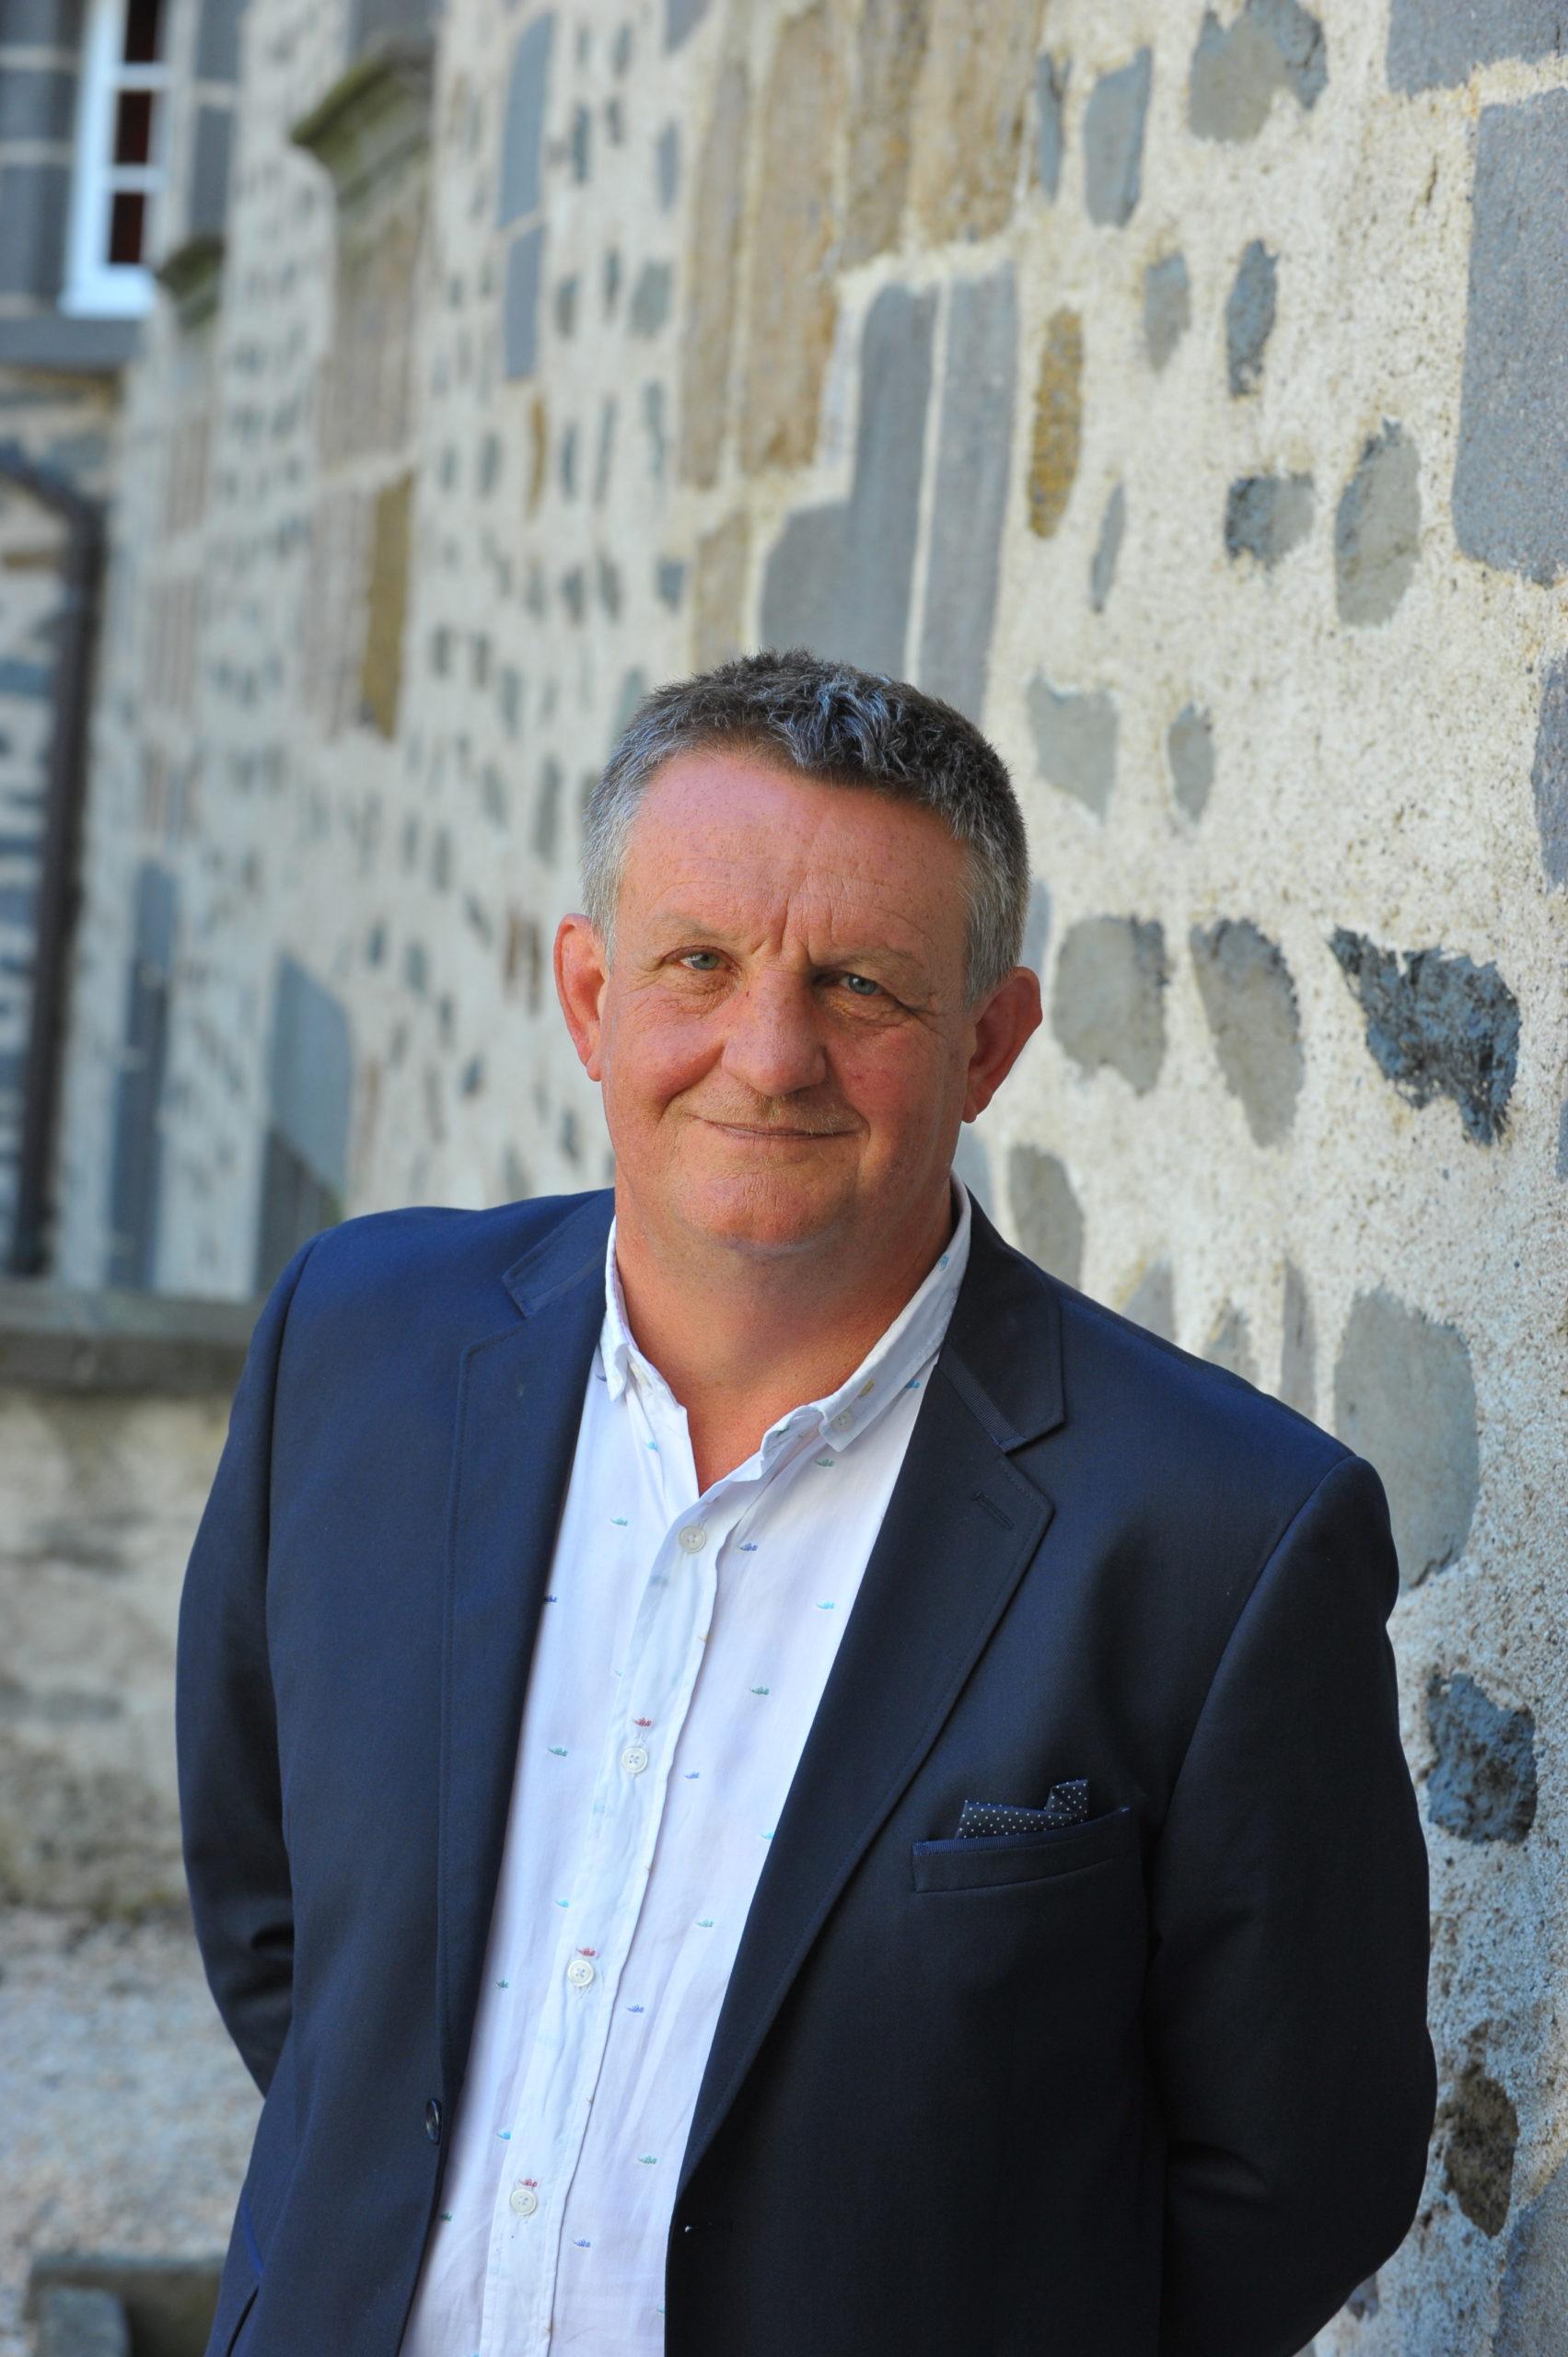 Frédéric DELCROS